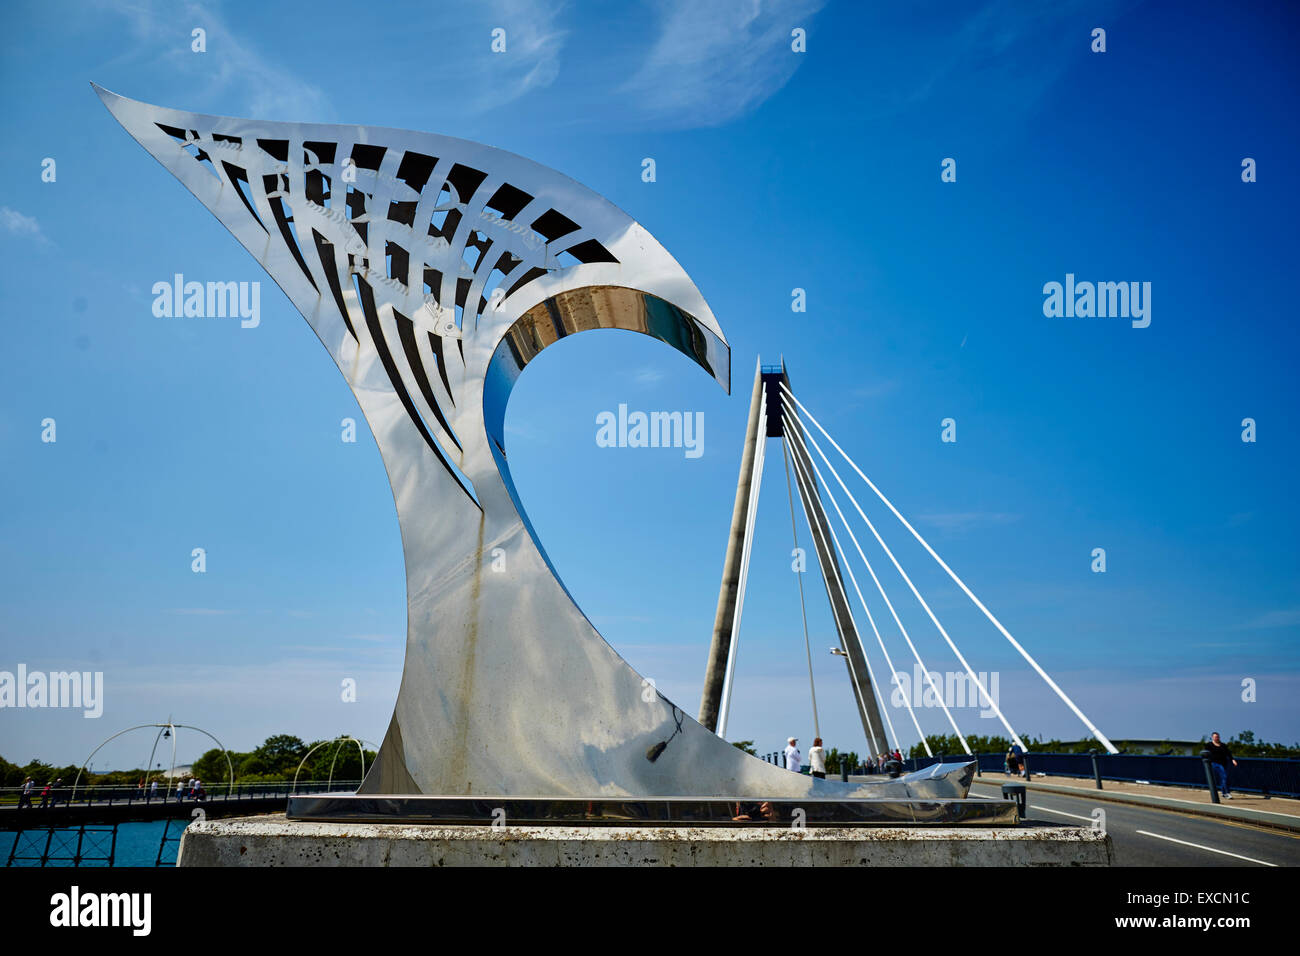 Marine Lake Bridge in the seaside town of Southport - Stock Image